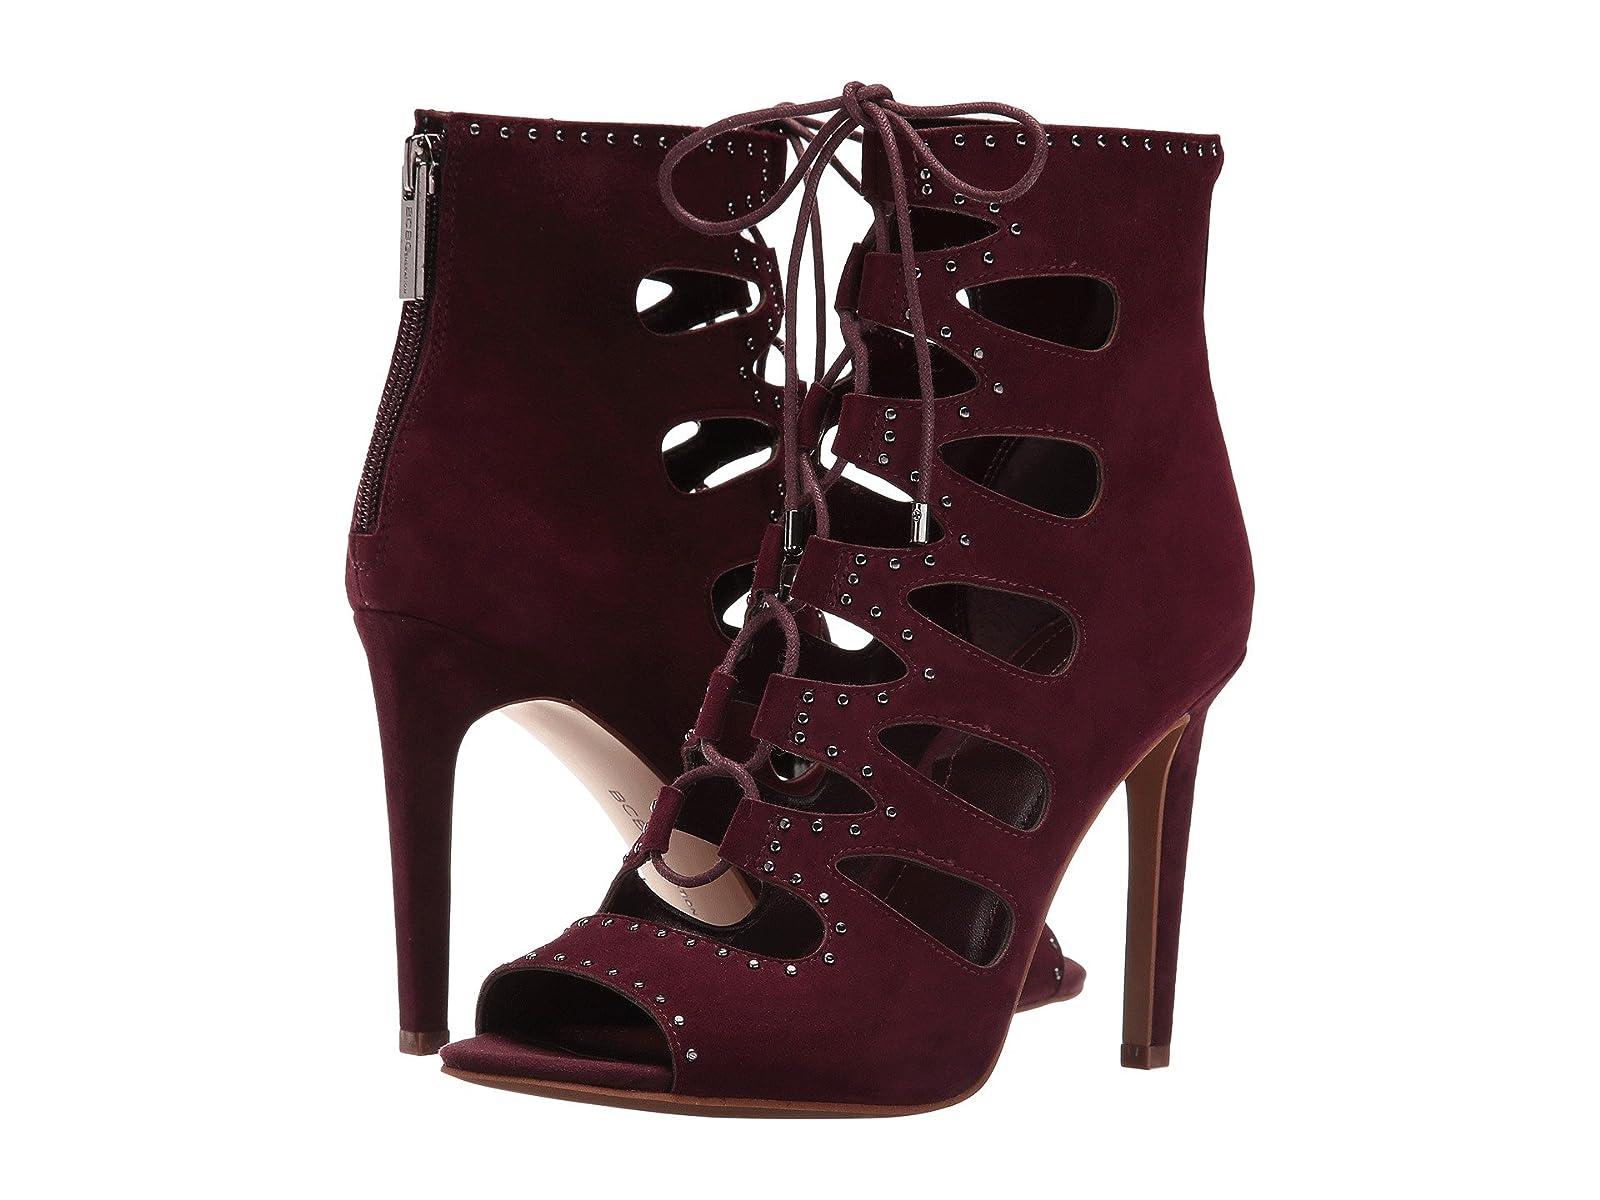 BCBGeneration CherriesCheap and distinctive eye-catching shoes